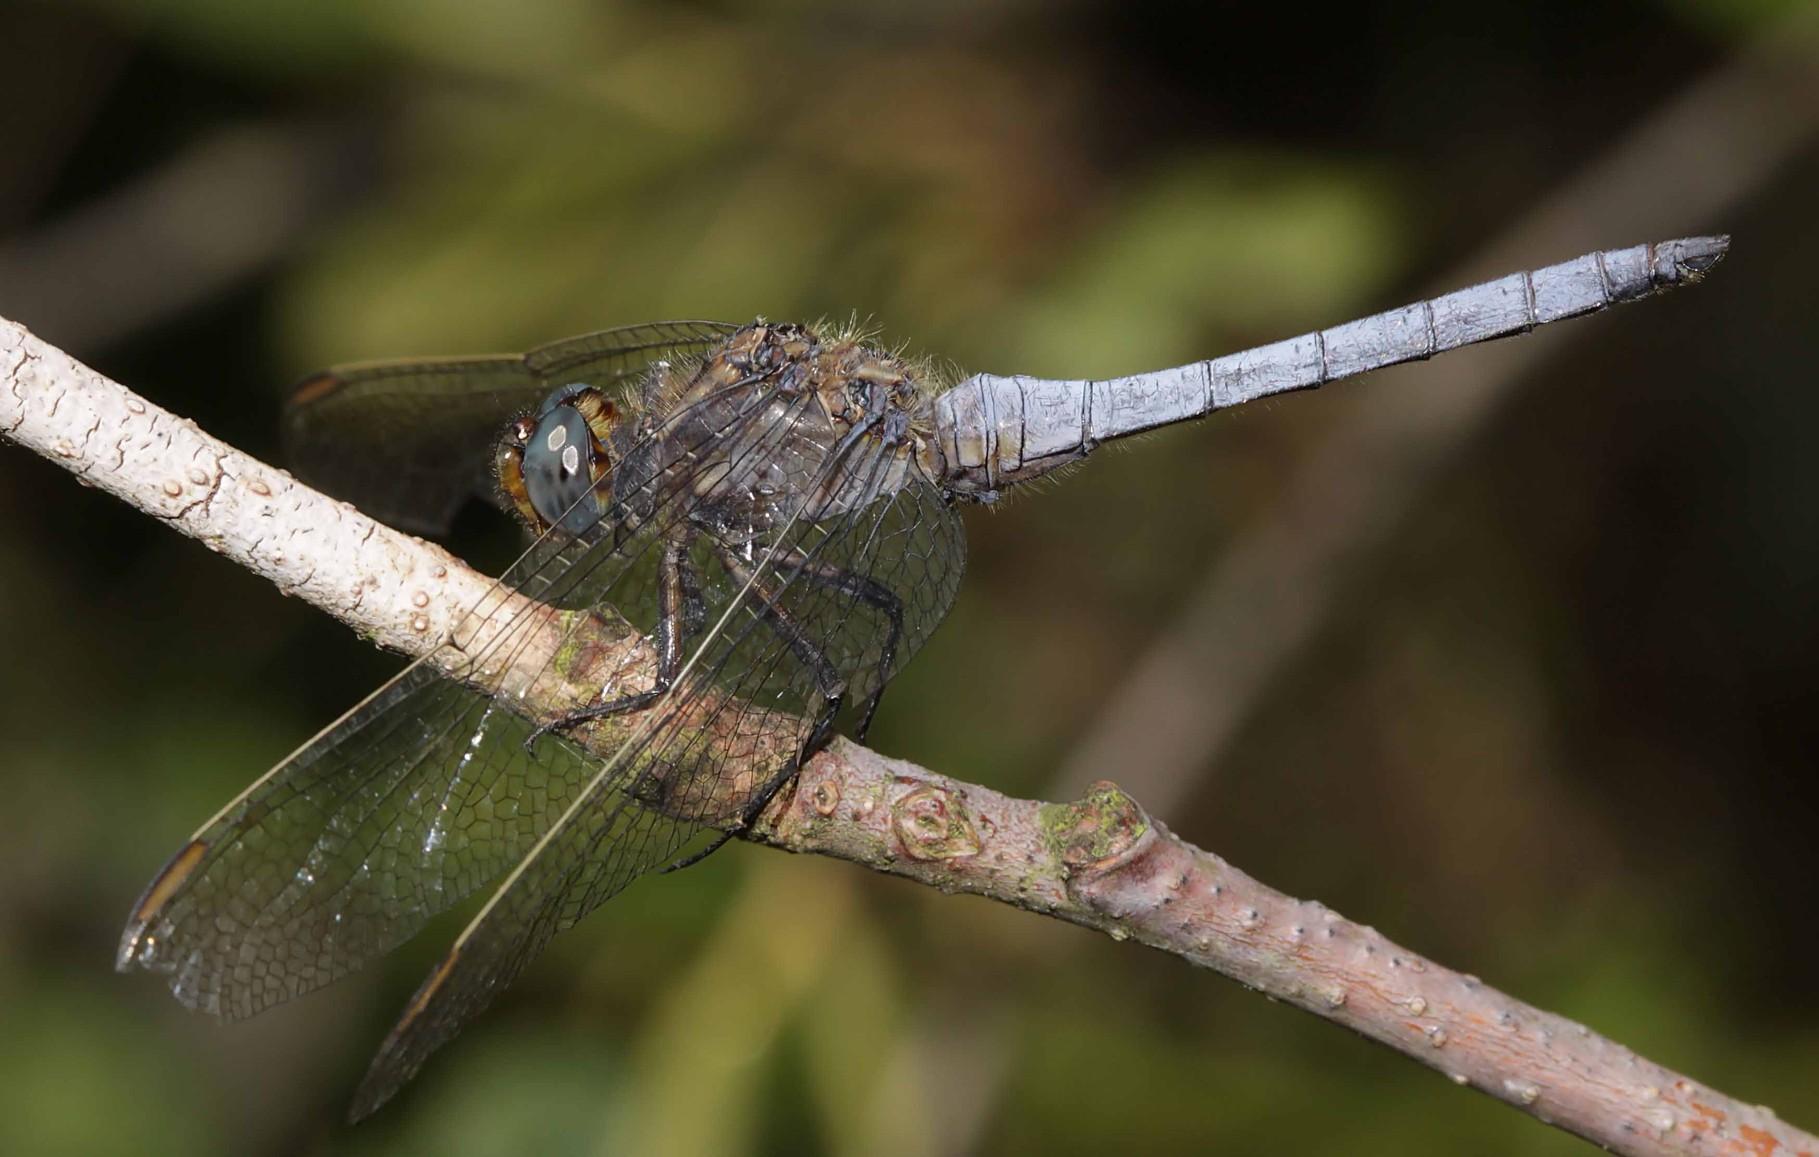 Kleiner Blaupfeil, Orthetrum coerulescens.